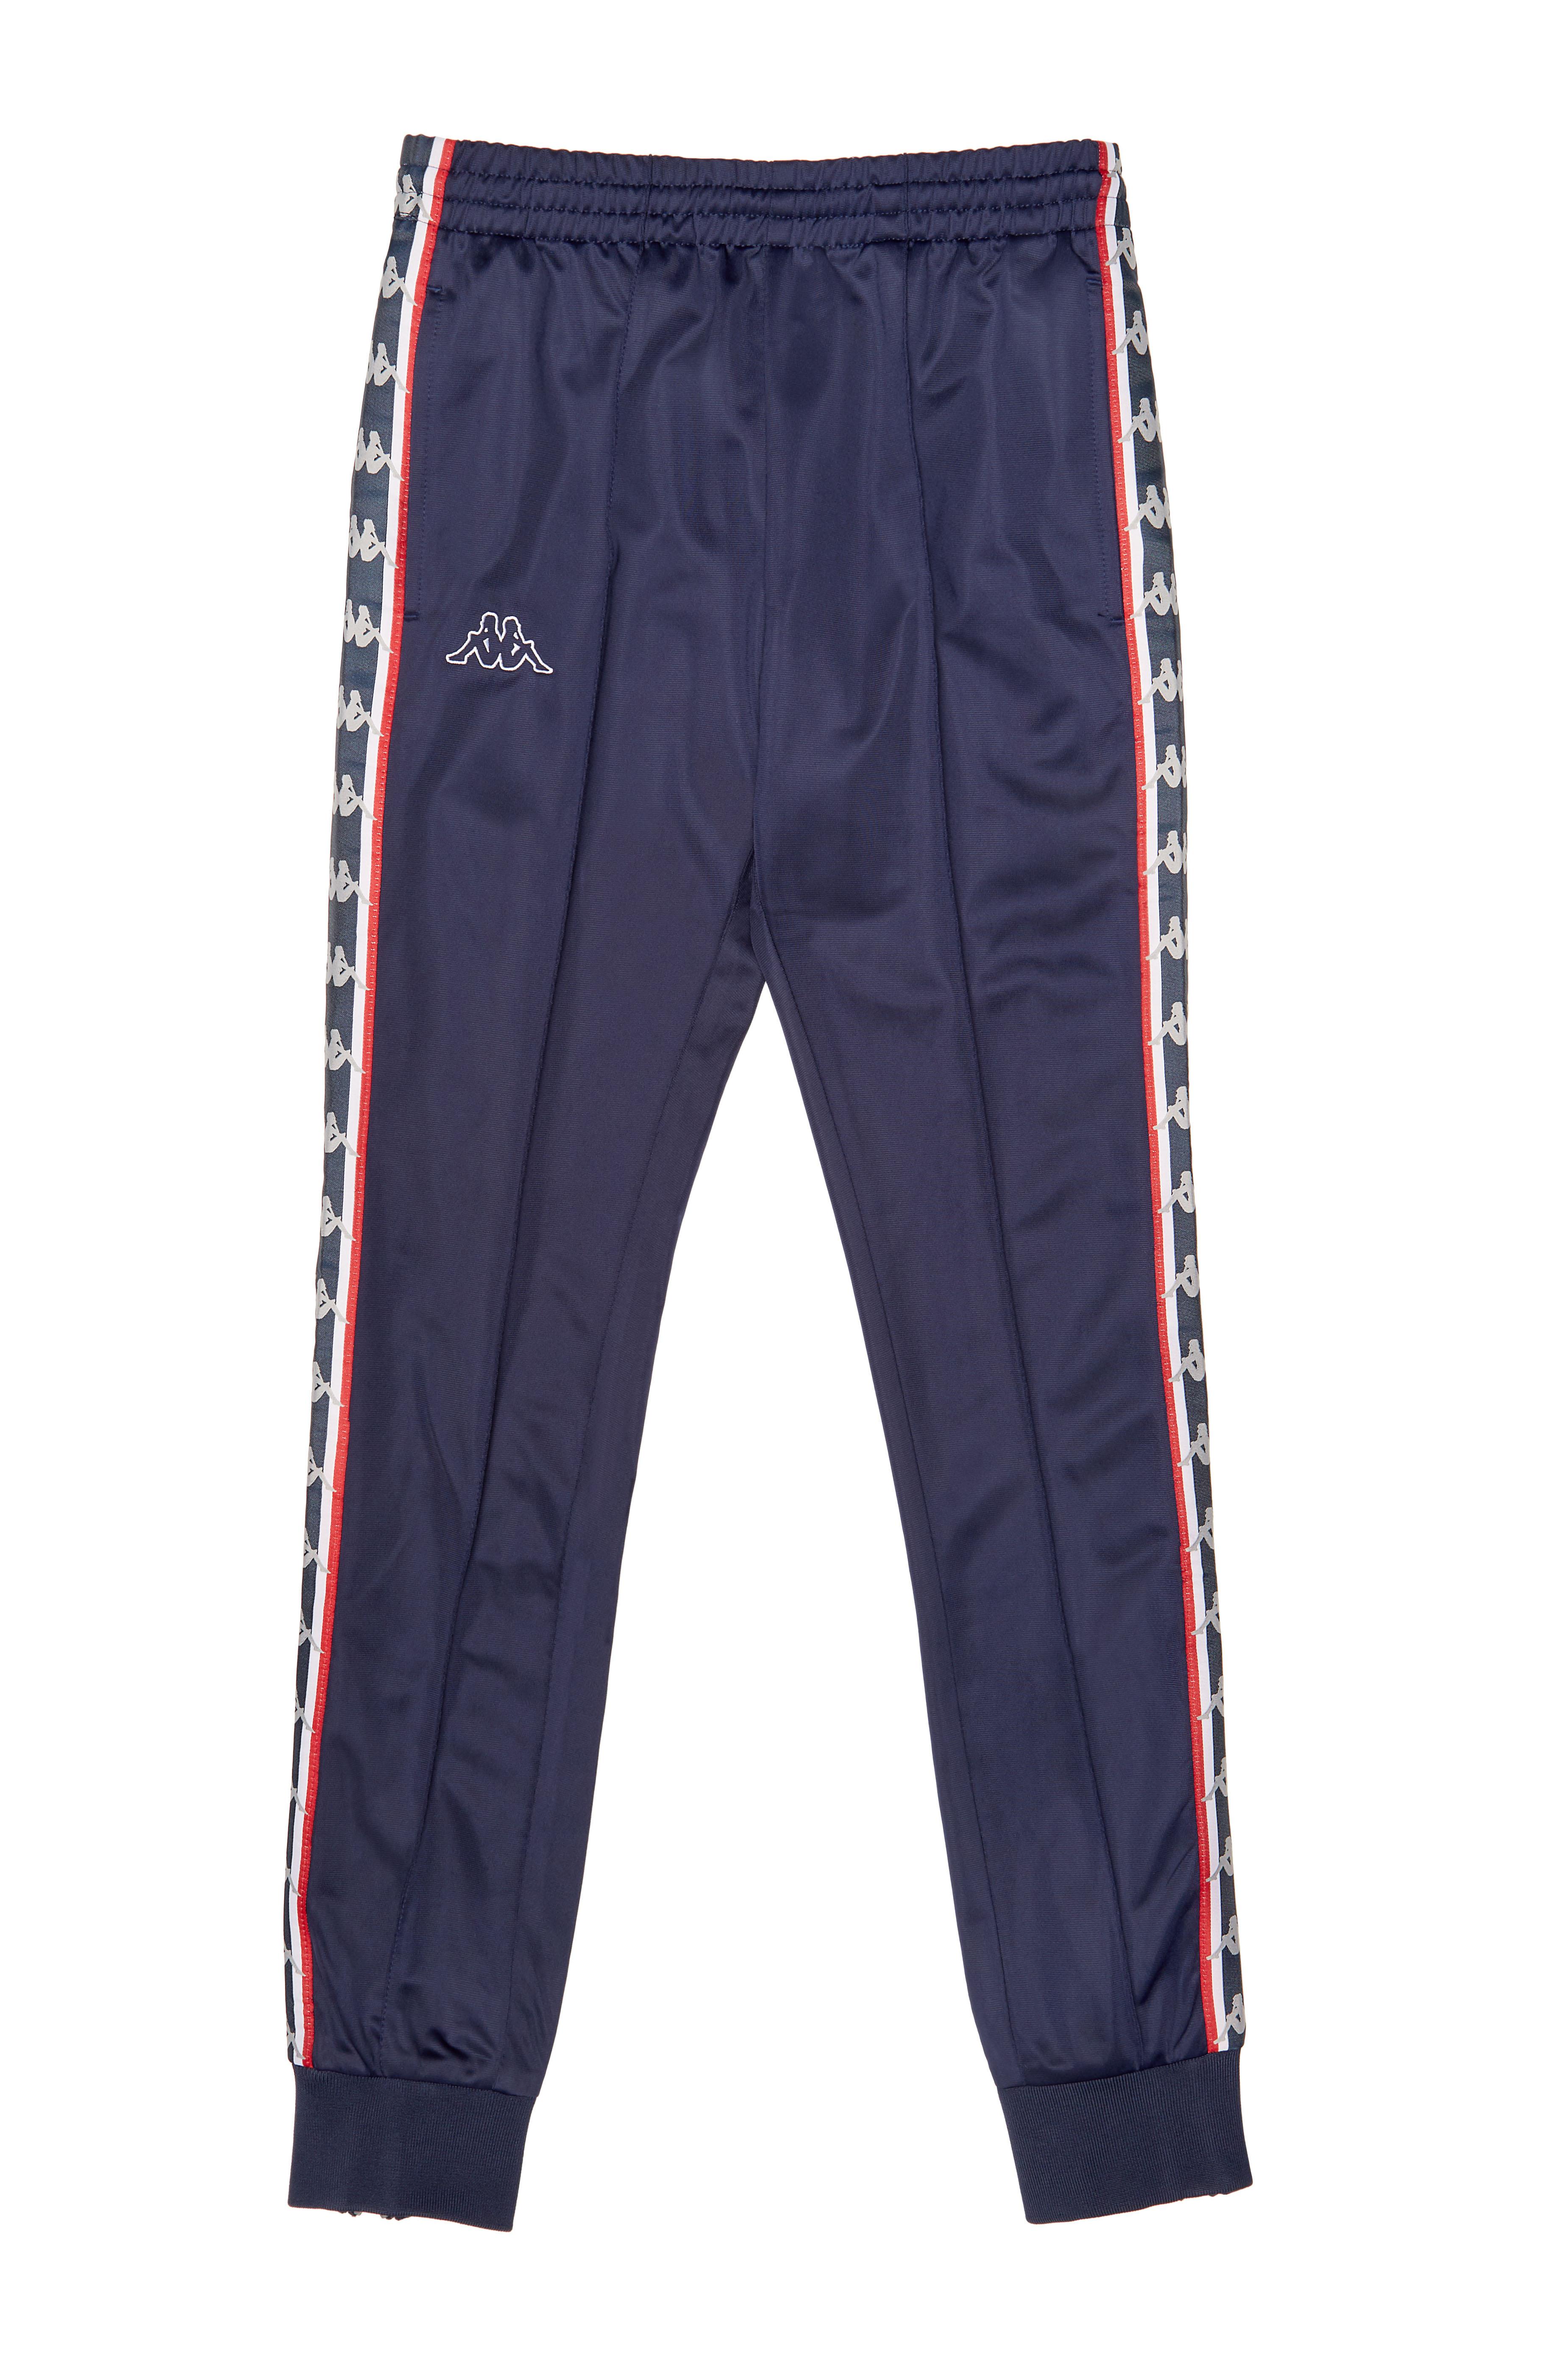 SSENSE_Kappa_SSENSE Exclusive Navy Track Pants